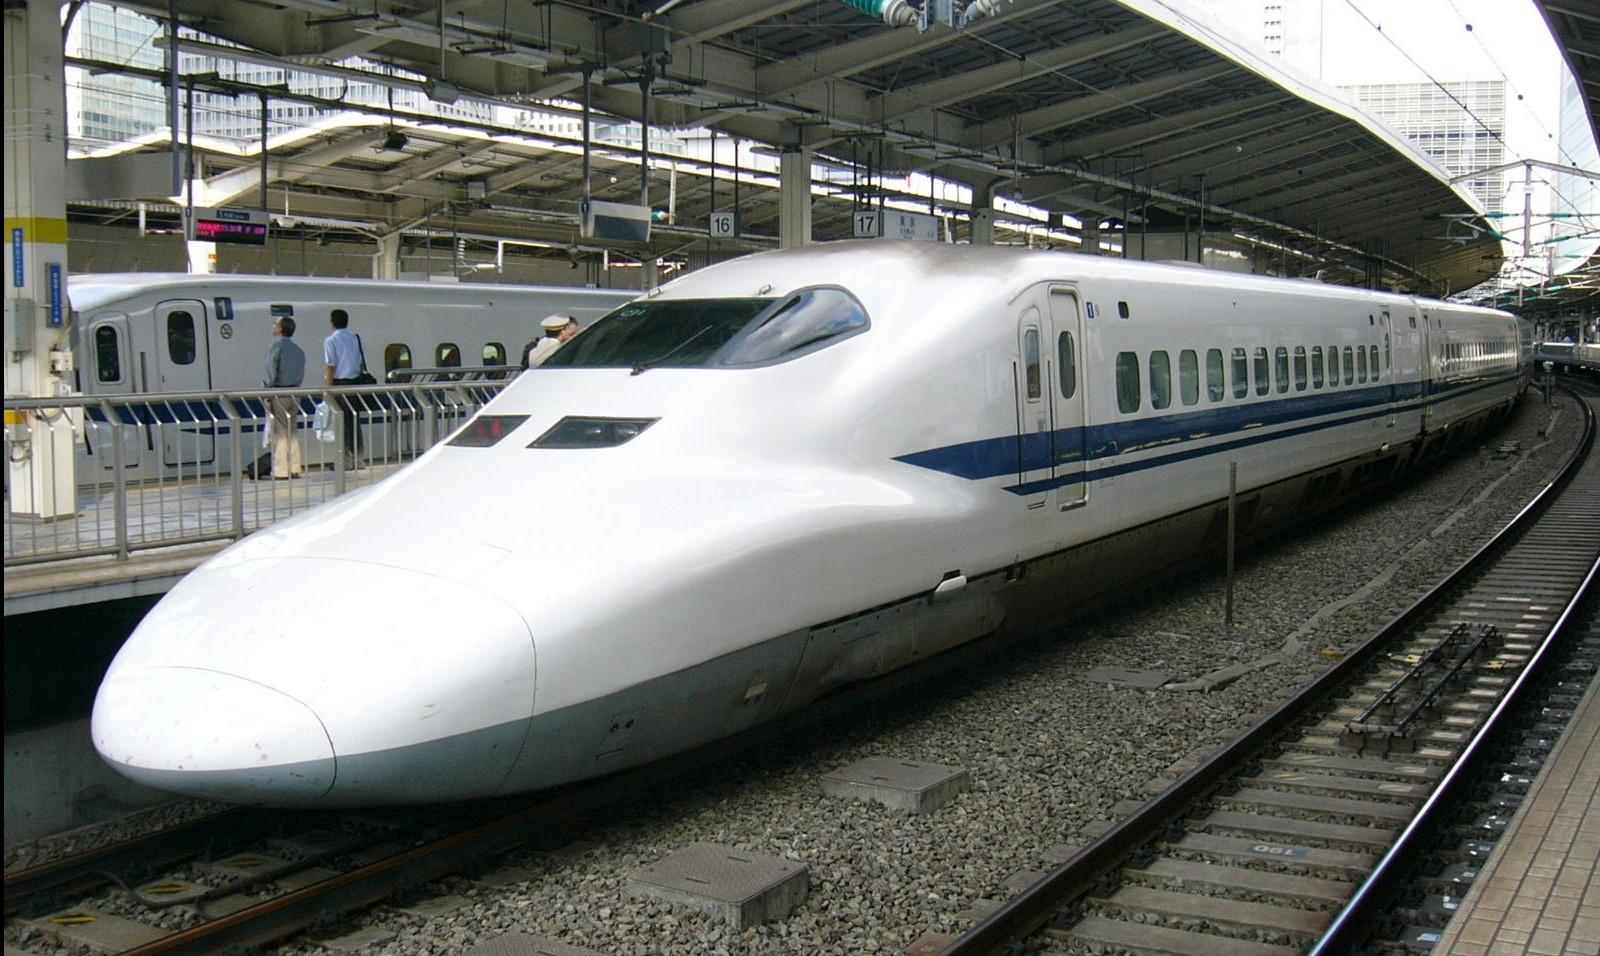 Drawn railroad shinkansen Wonders 3 the the Behind